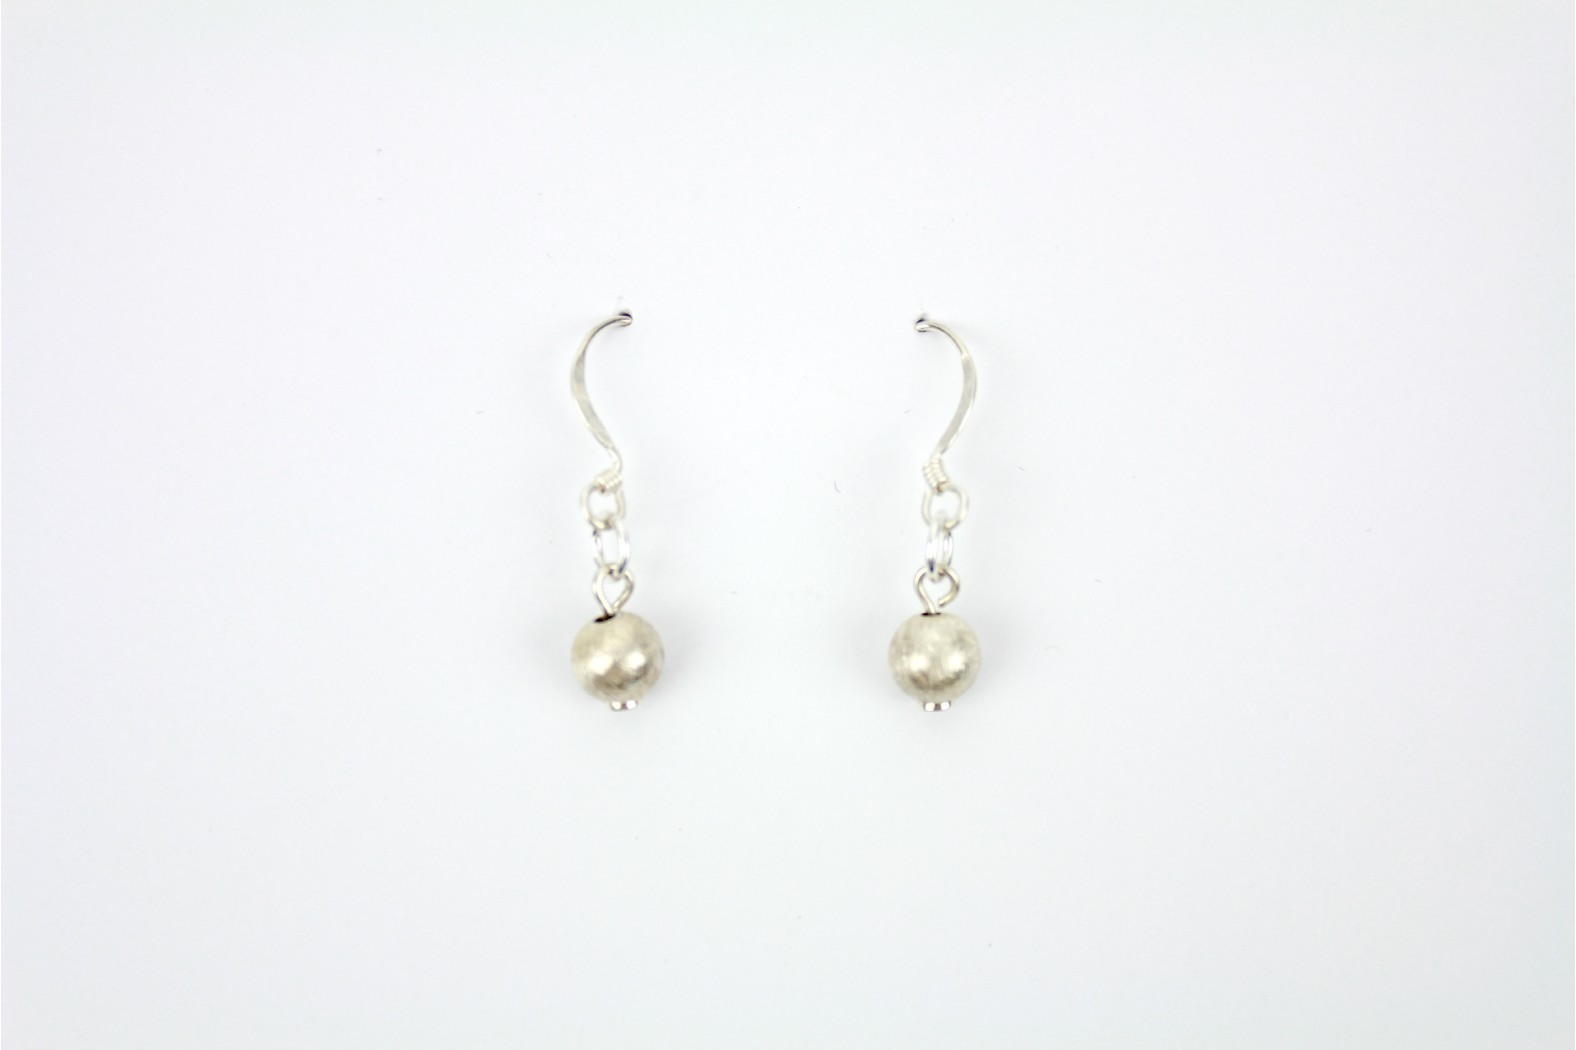 Single Ball Matt silver drop earrings Hand Made Individual design